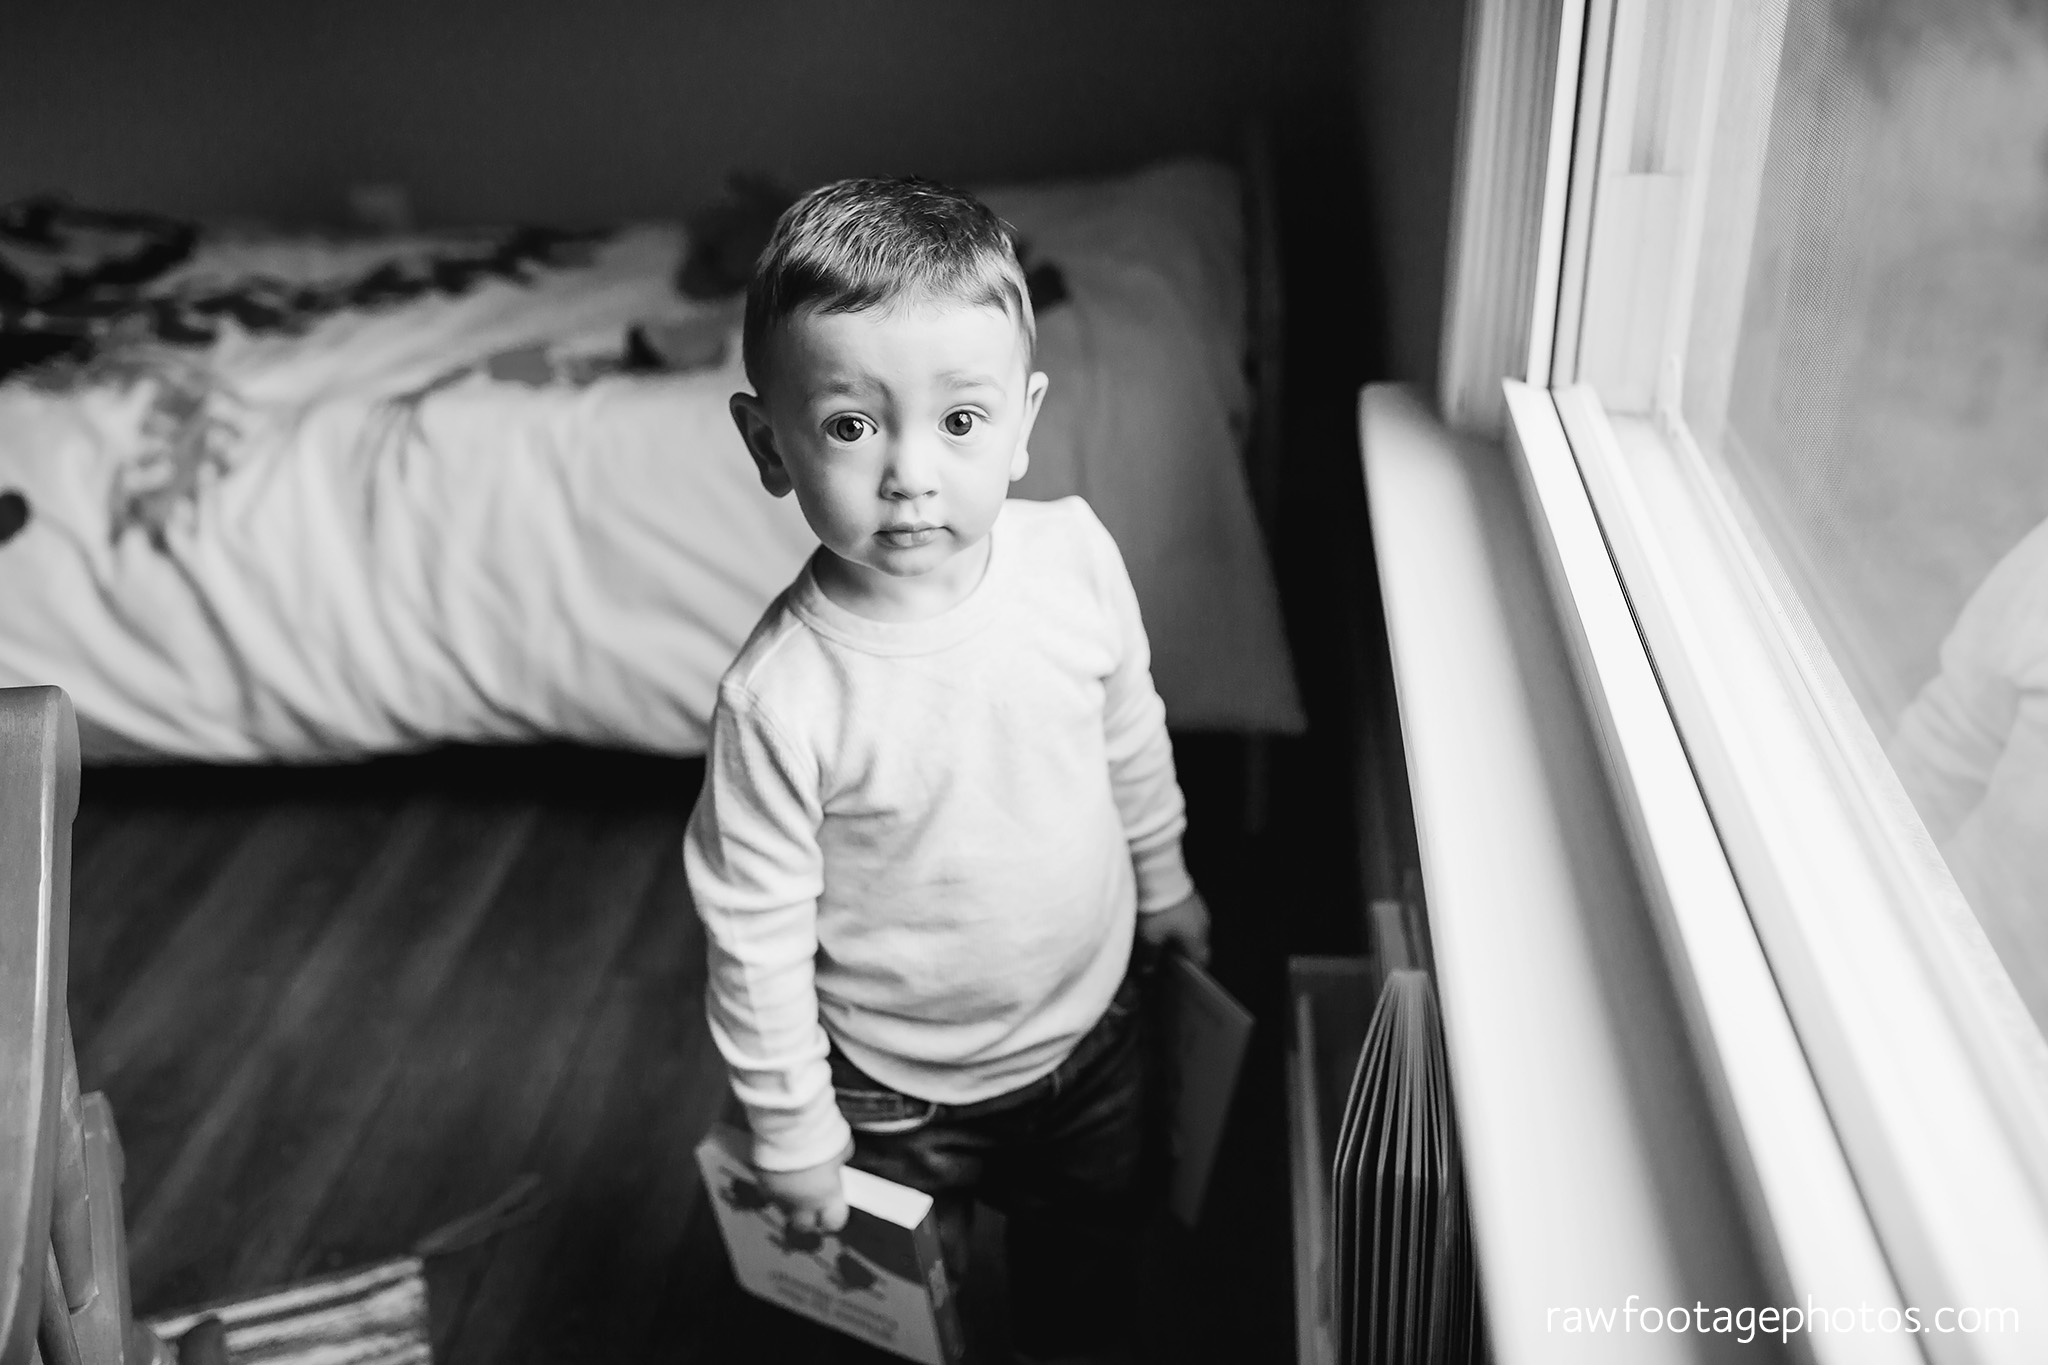 london_ontario_newborn_lifestyle_photographer-best_of_2018-raw_footage_photography017.jpg